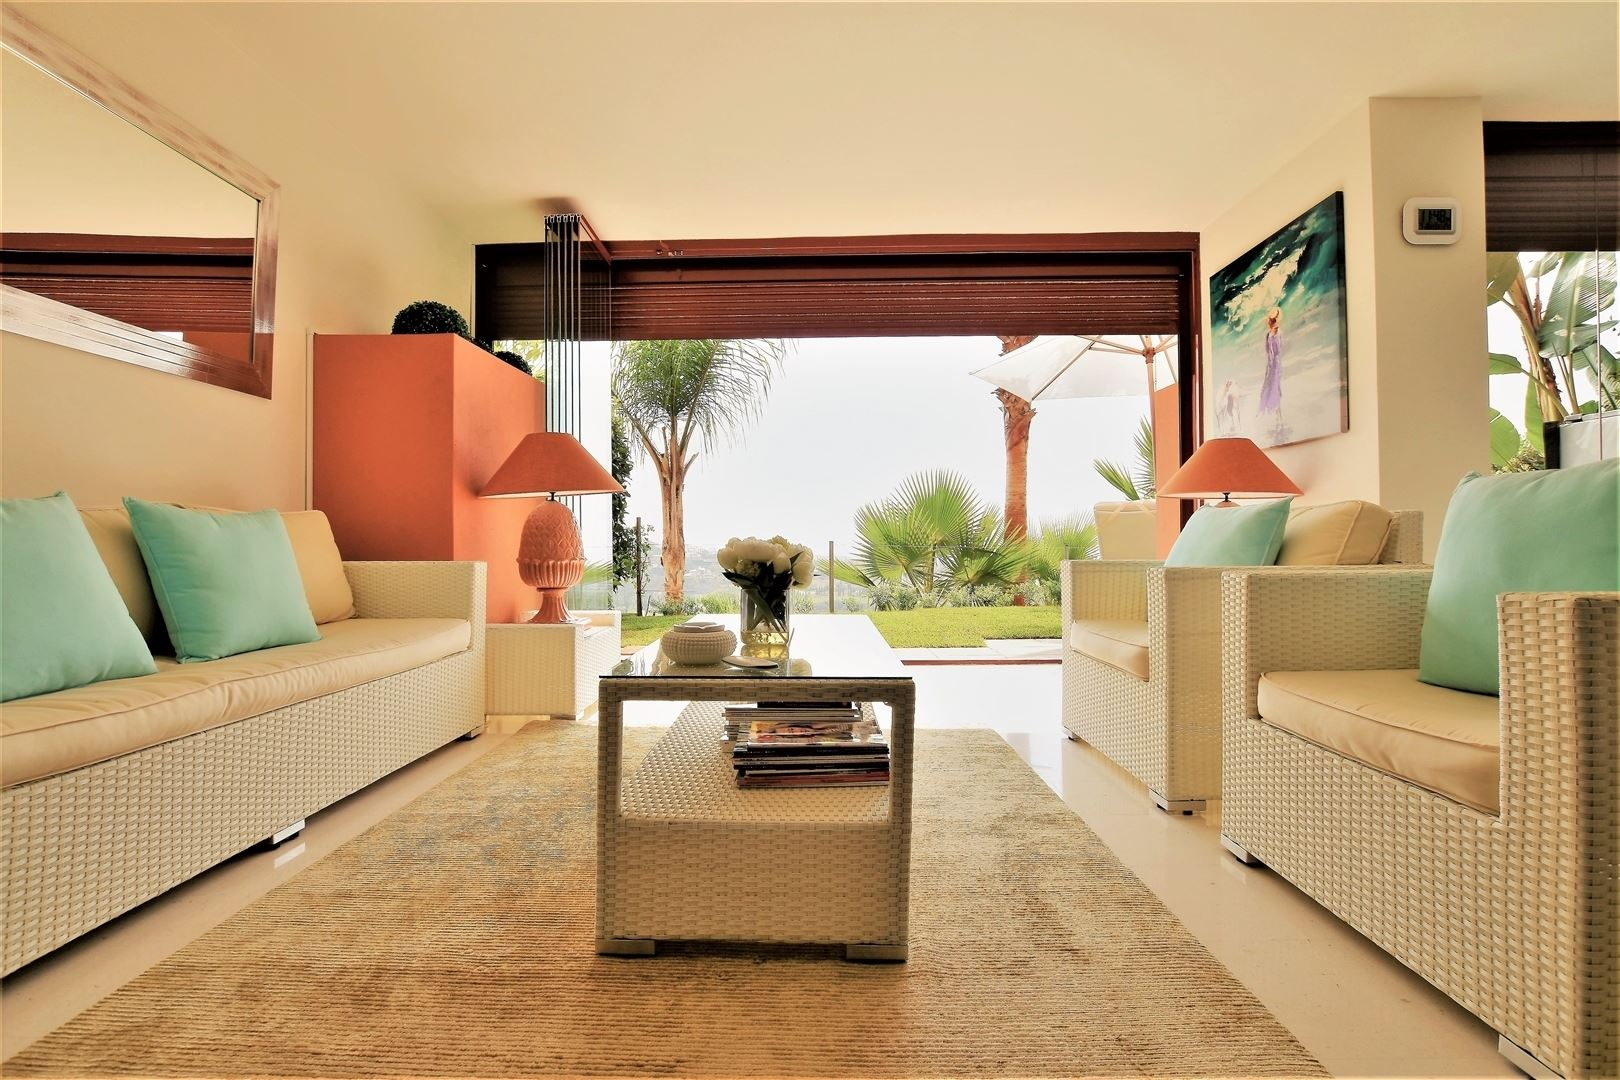 Foto 10 : Appartement te 29679 MARBELLA (Spanje) - Prijs € 1.750